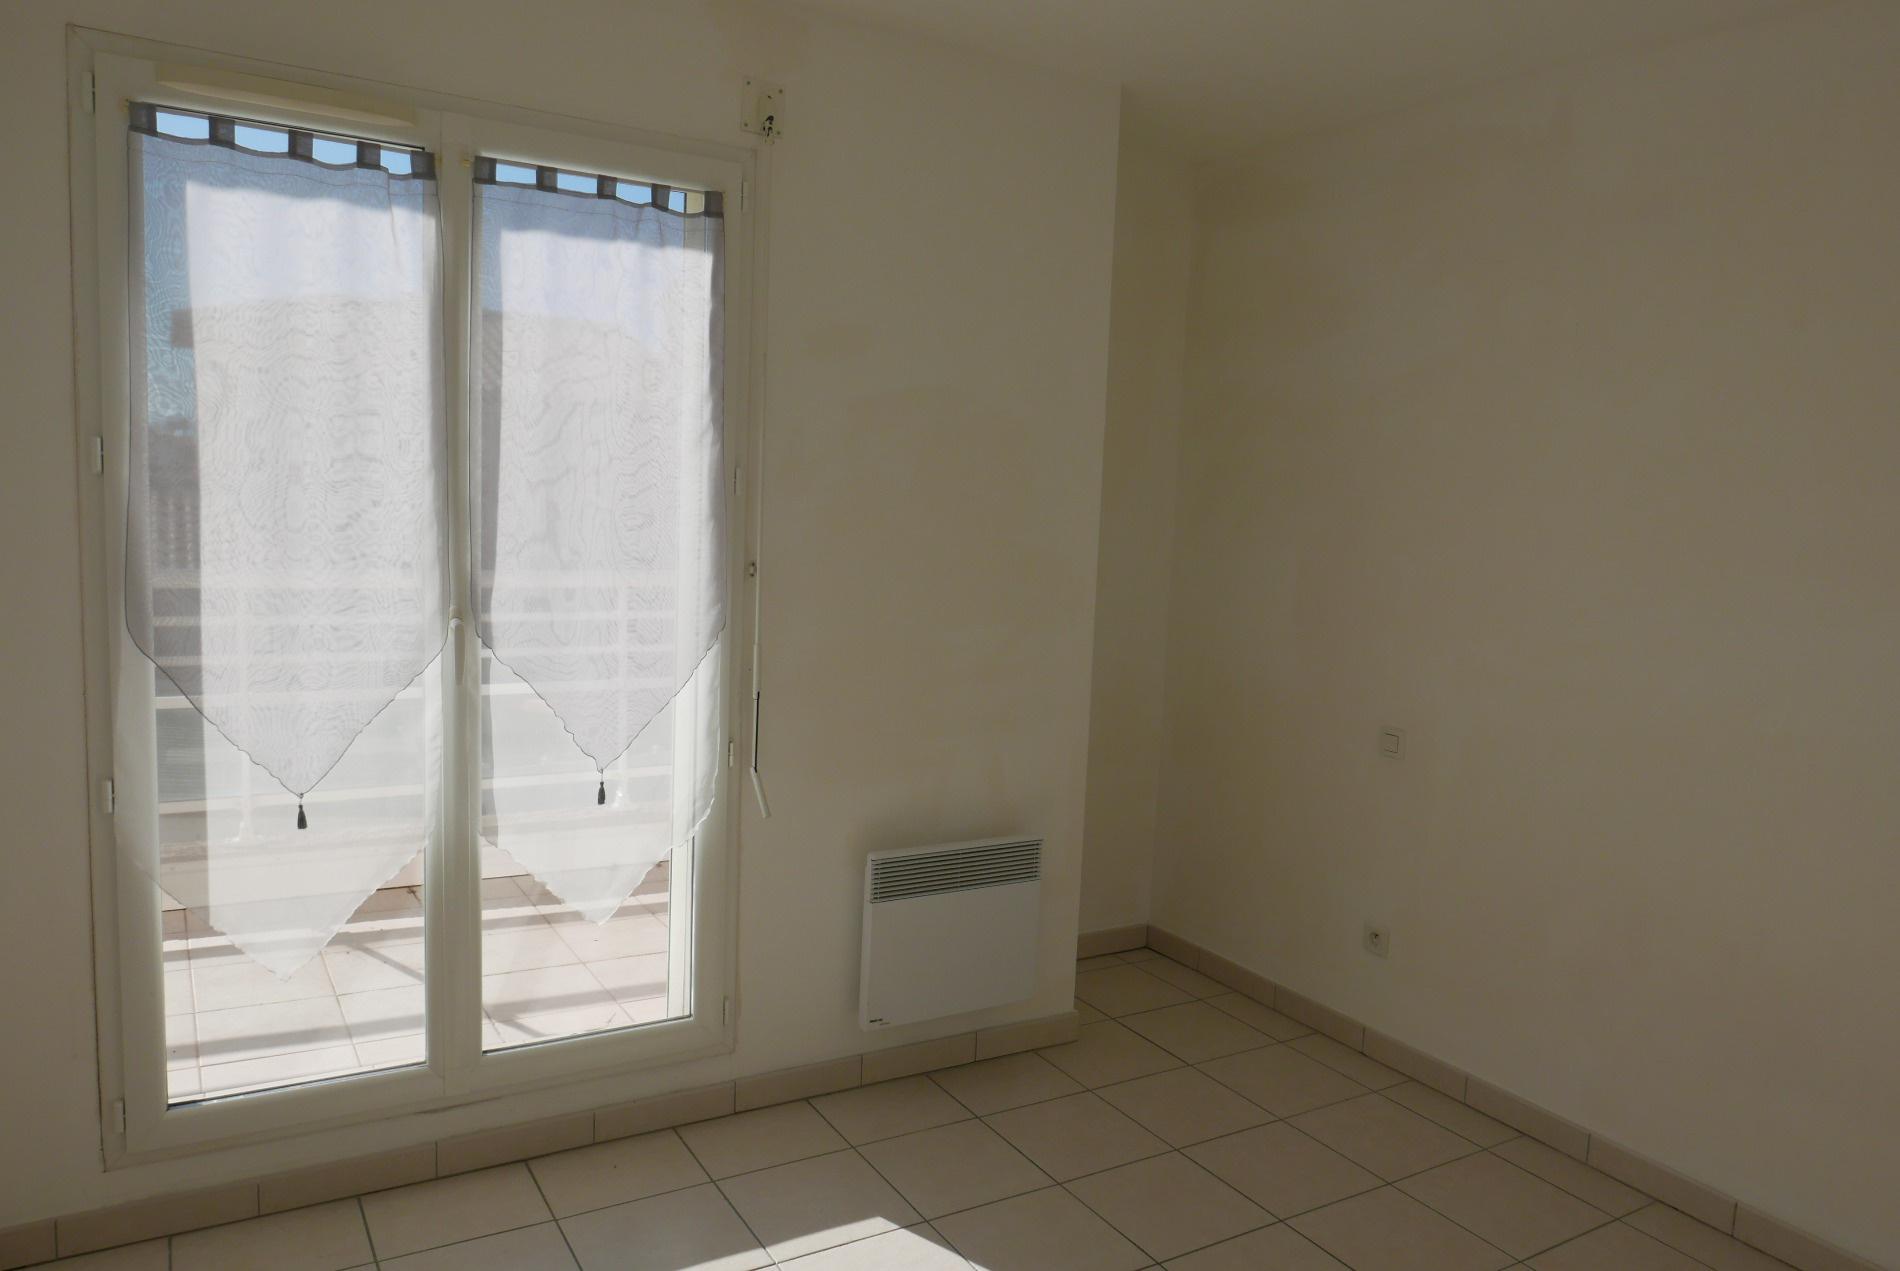 Chambre 3 etage